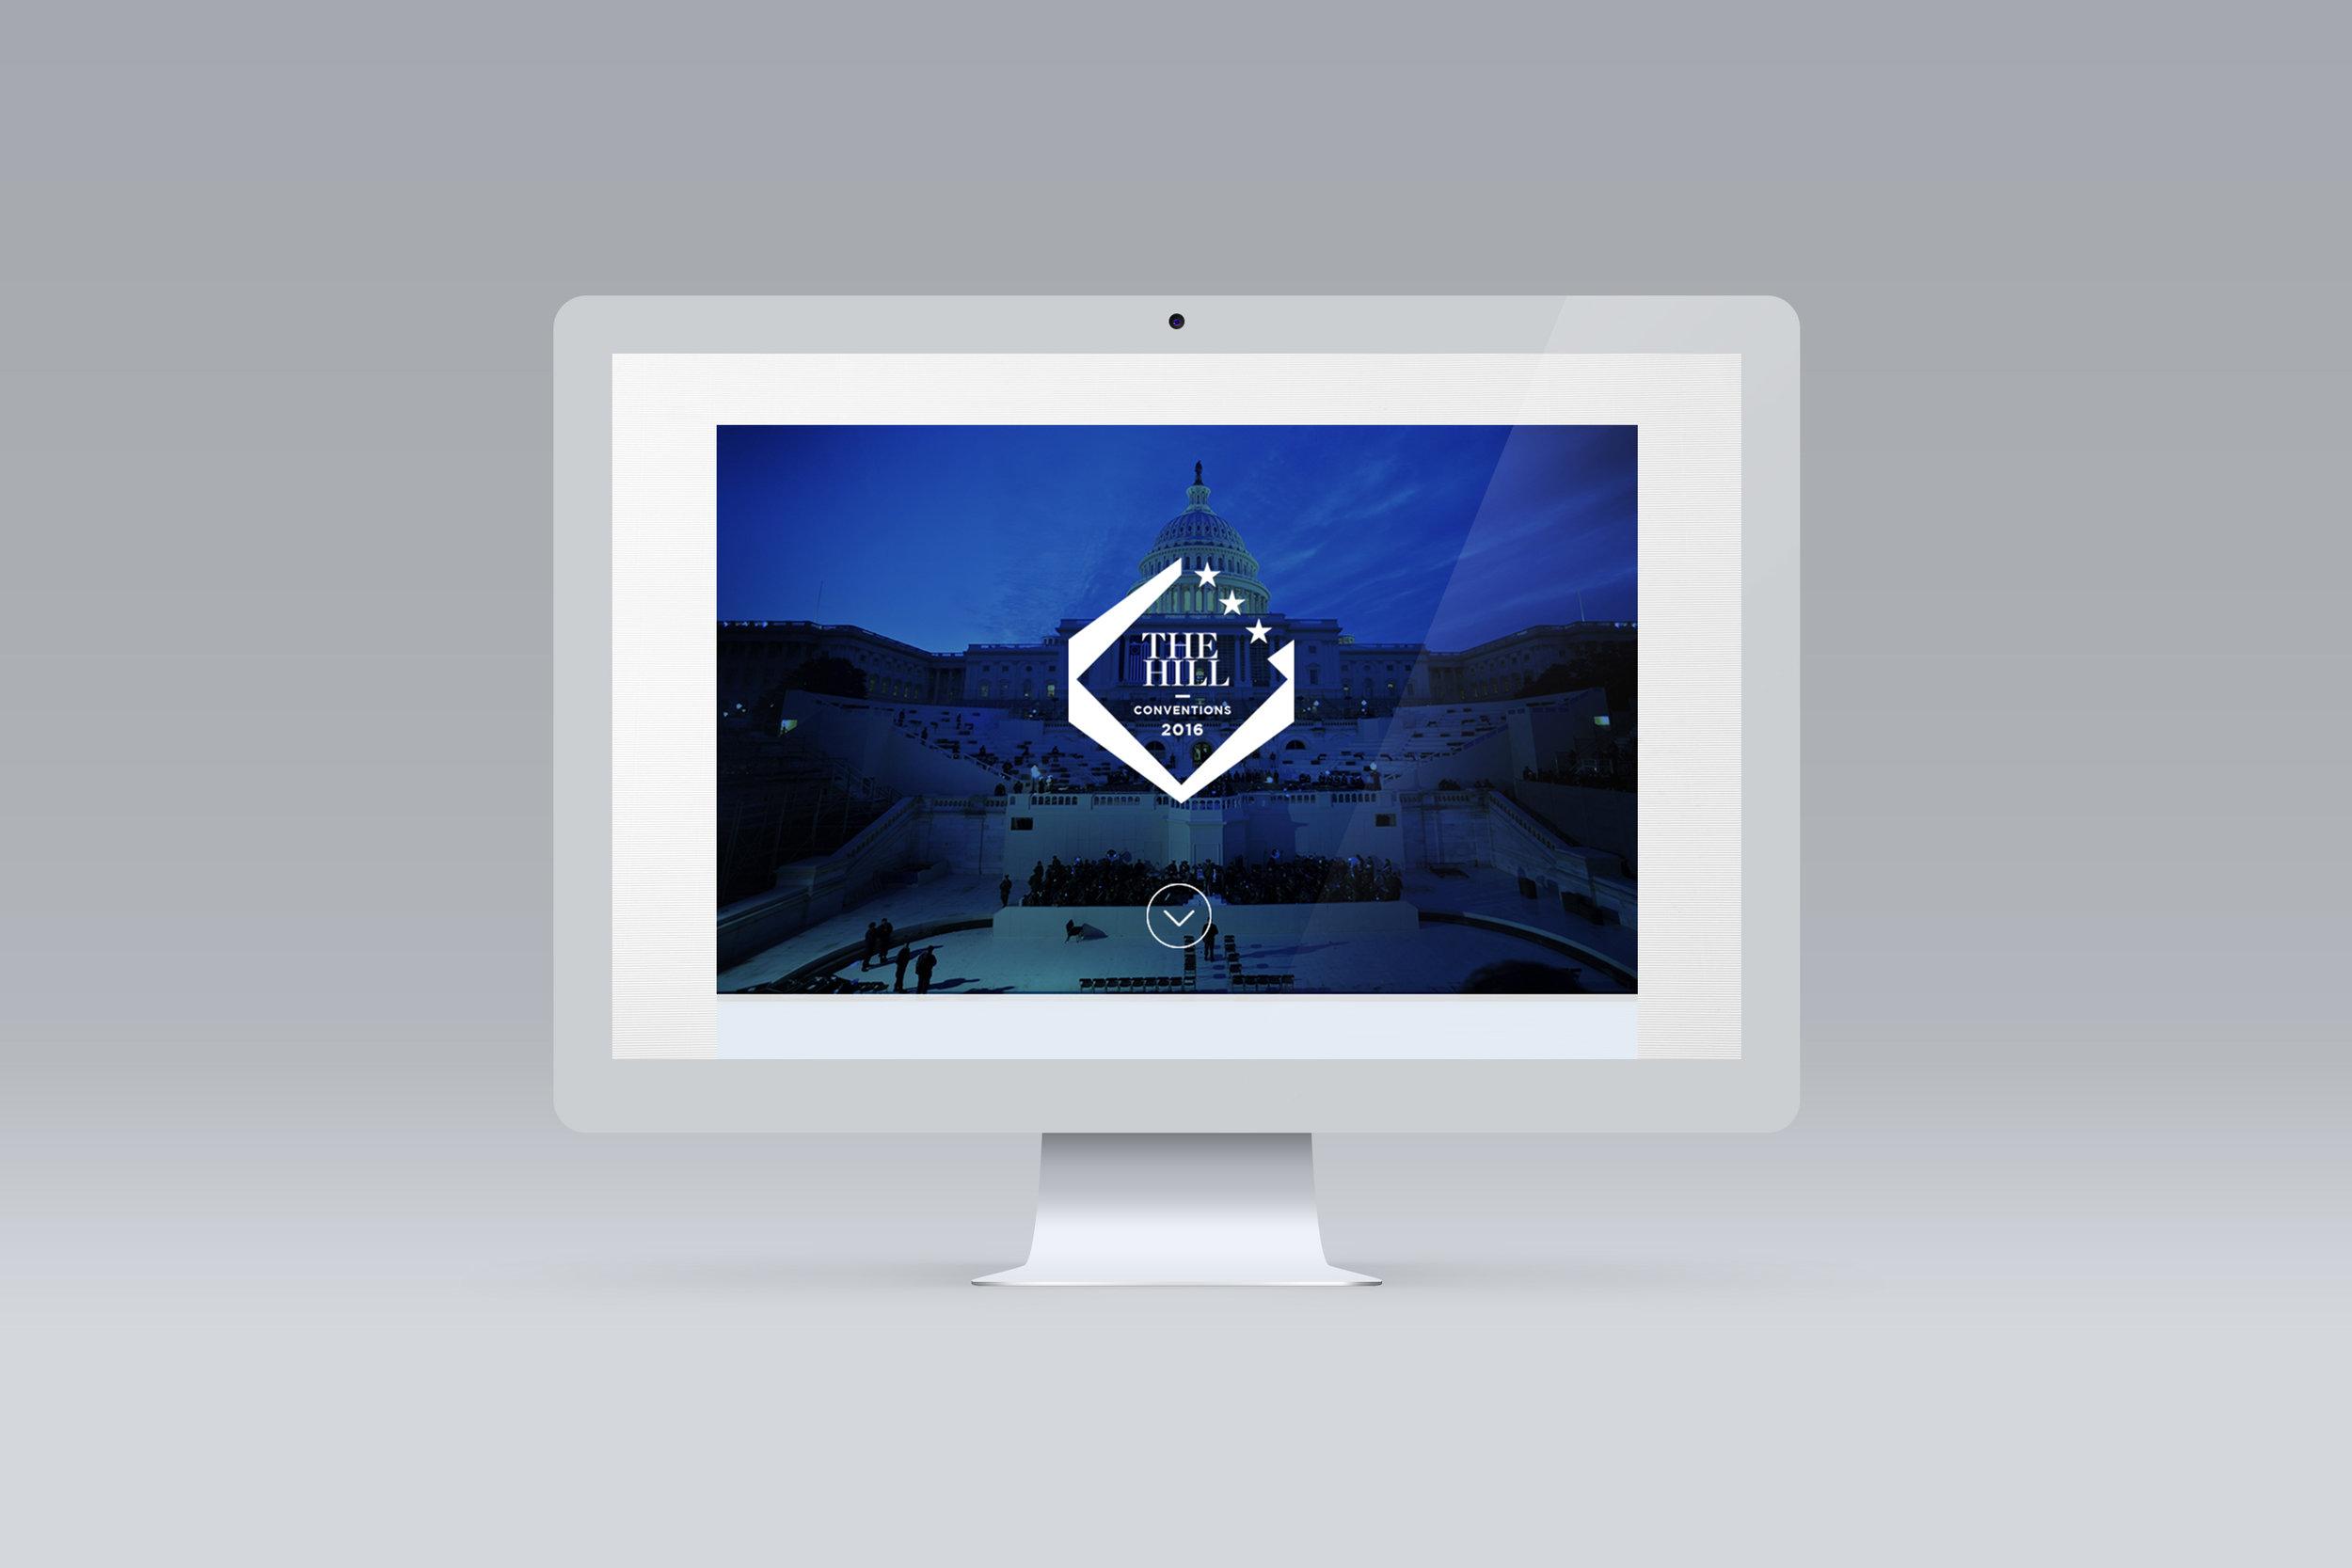 iMac-Mock-up.jpg